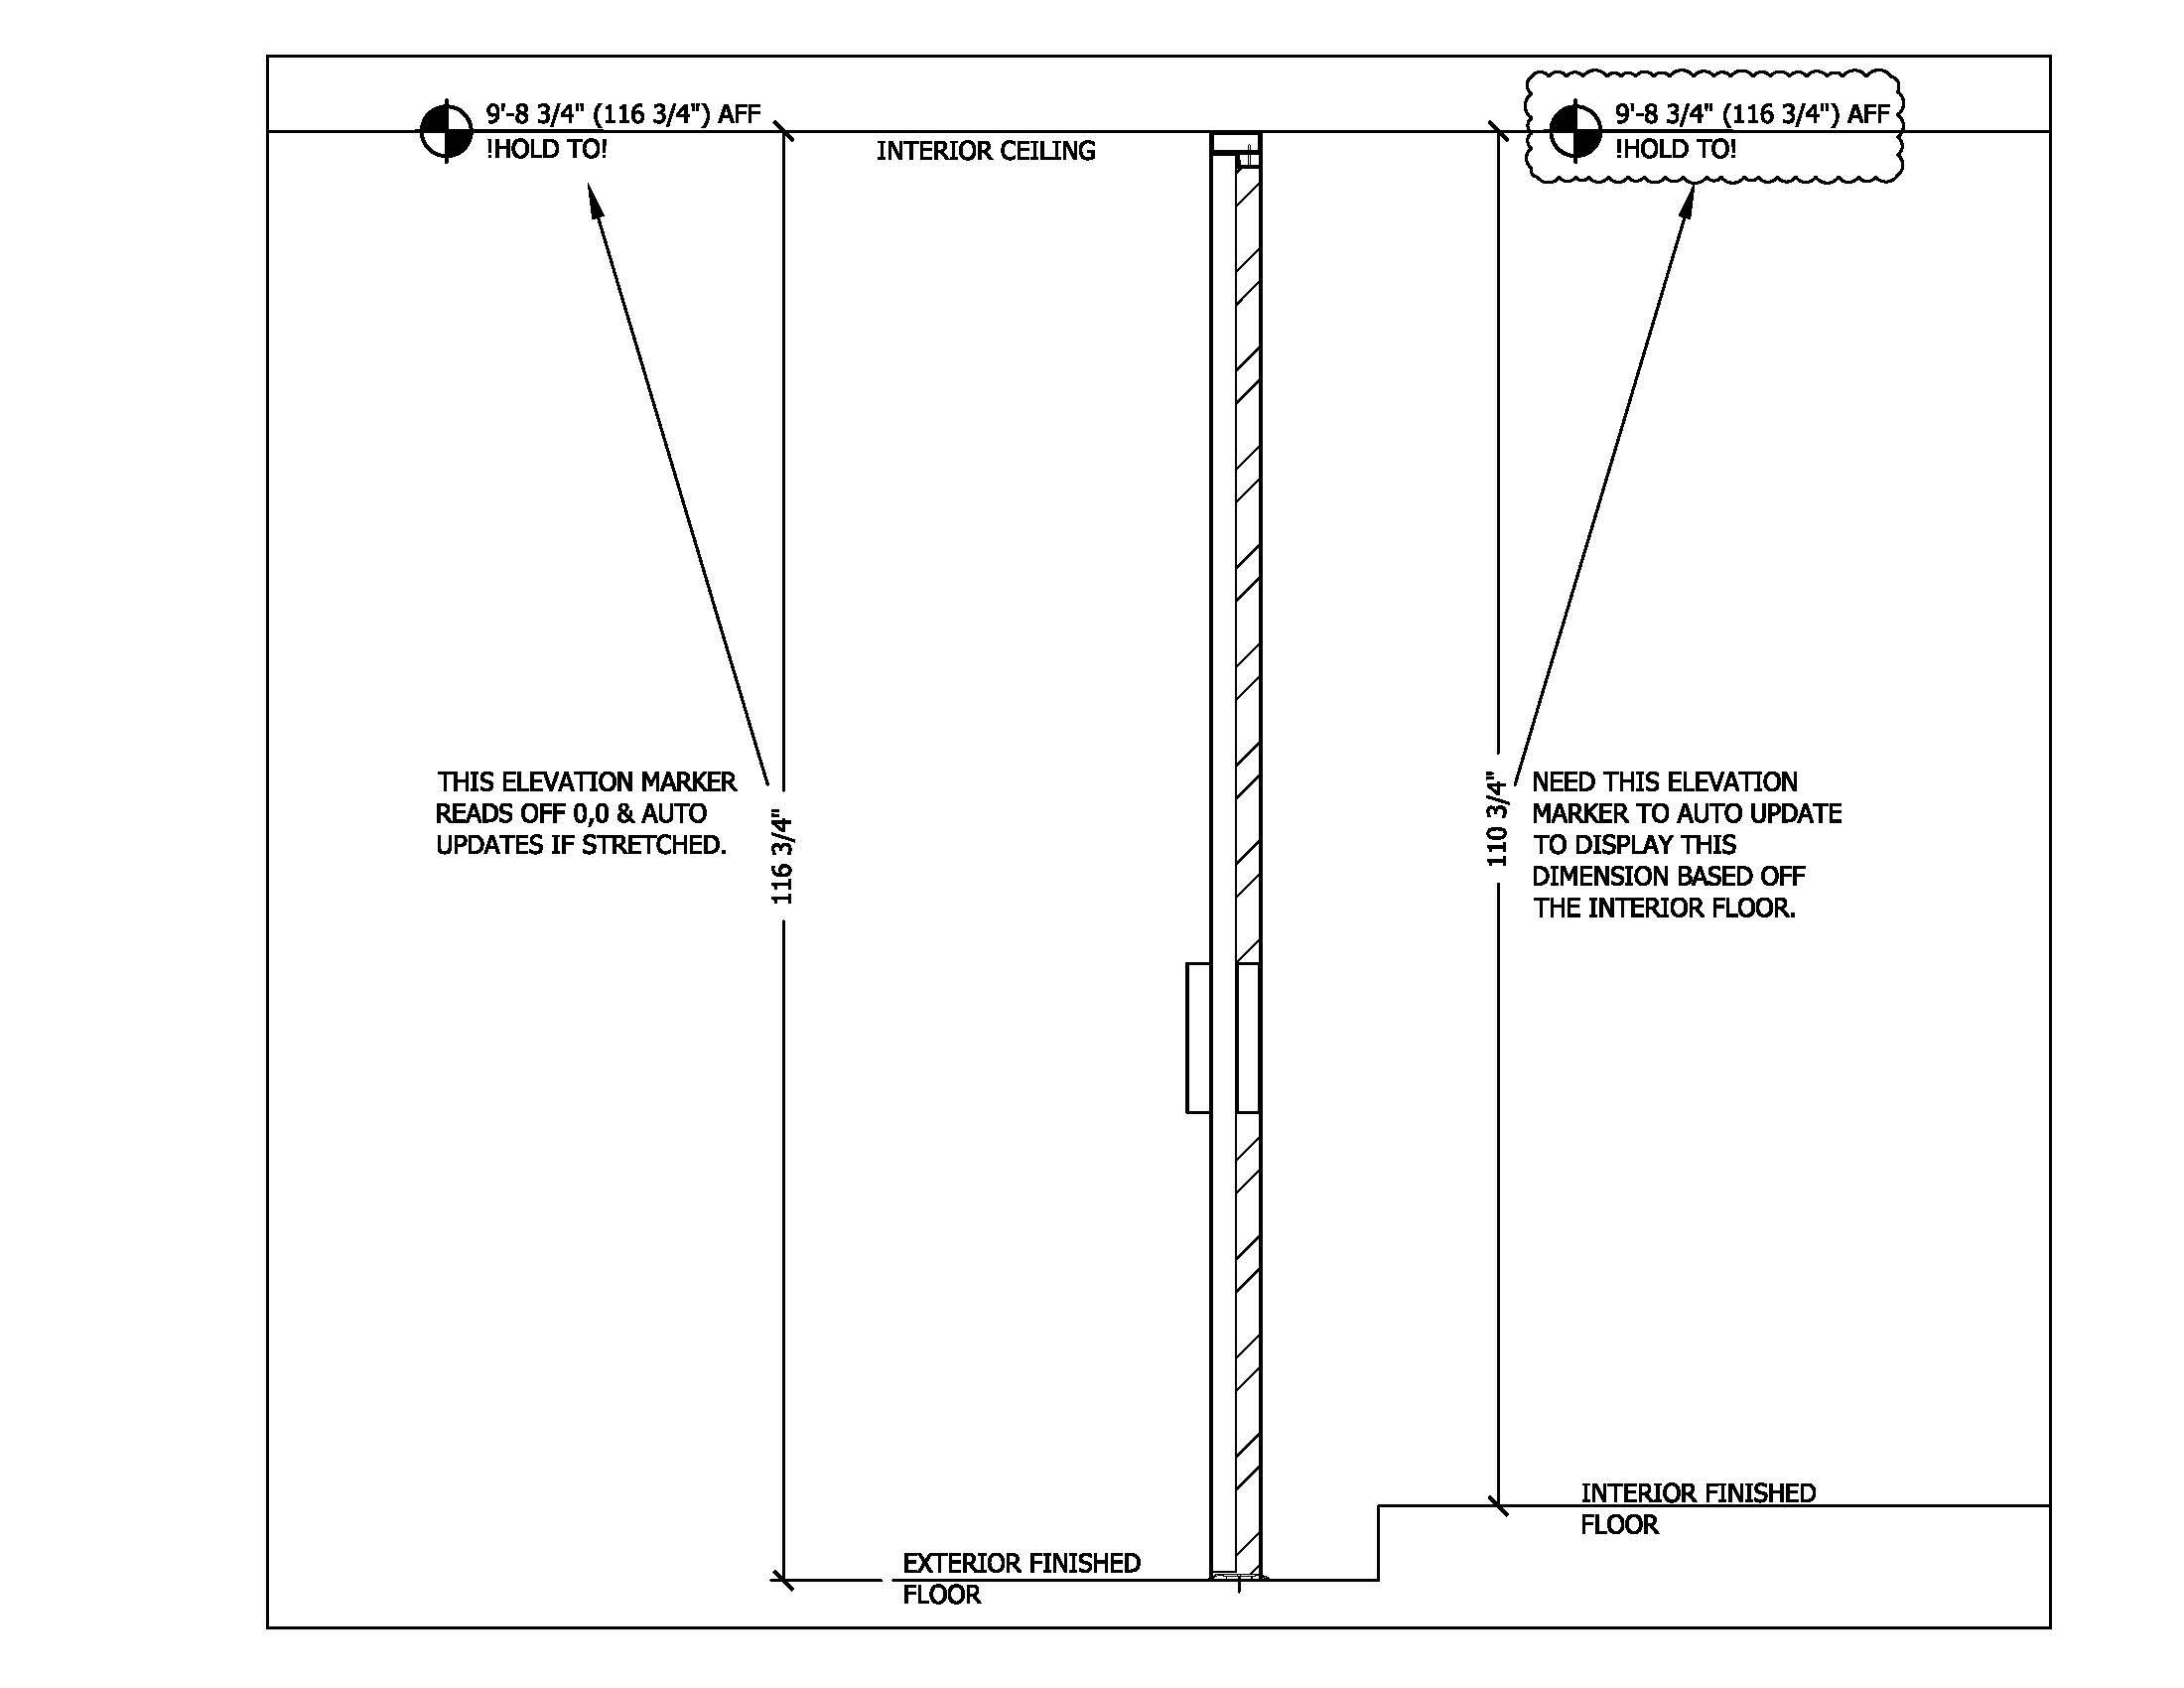 Floor Plan Elevation Markers : Placing elevation marker with multiple baselines cad